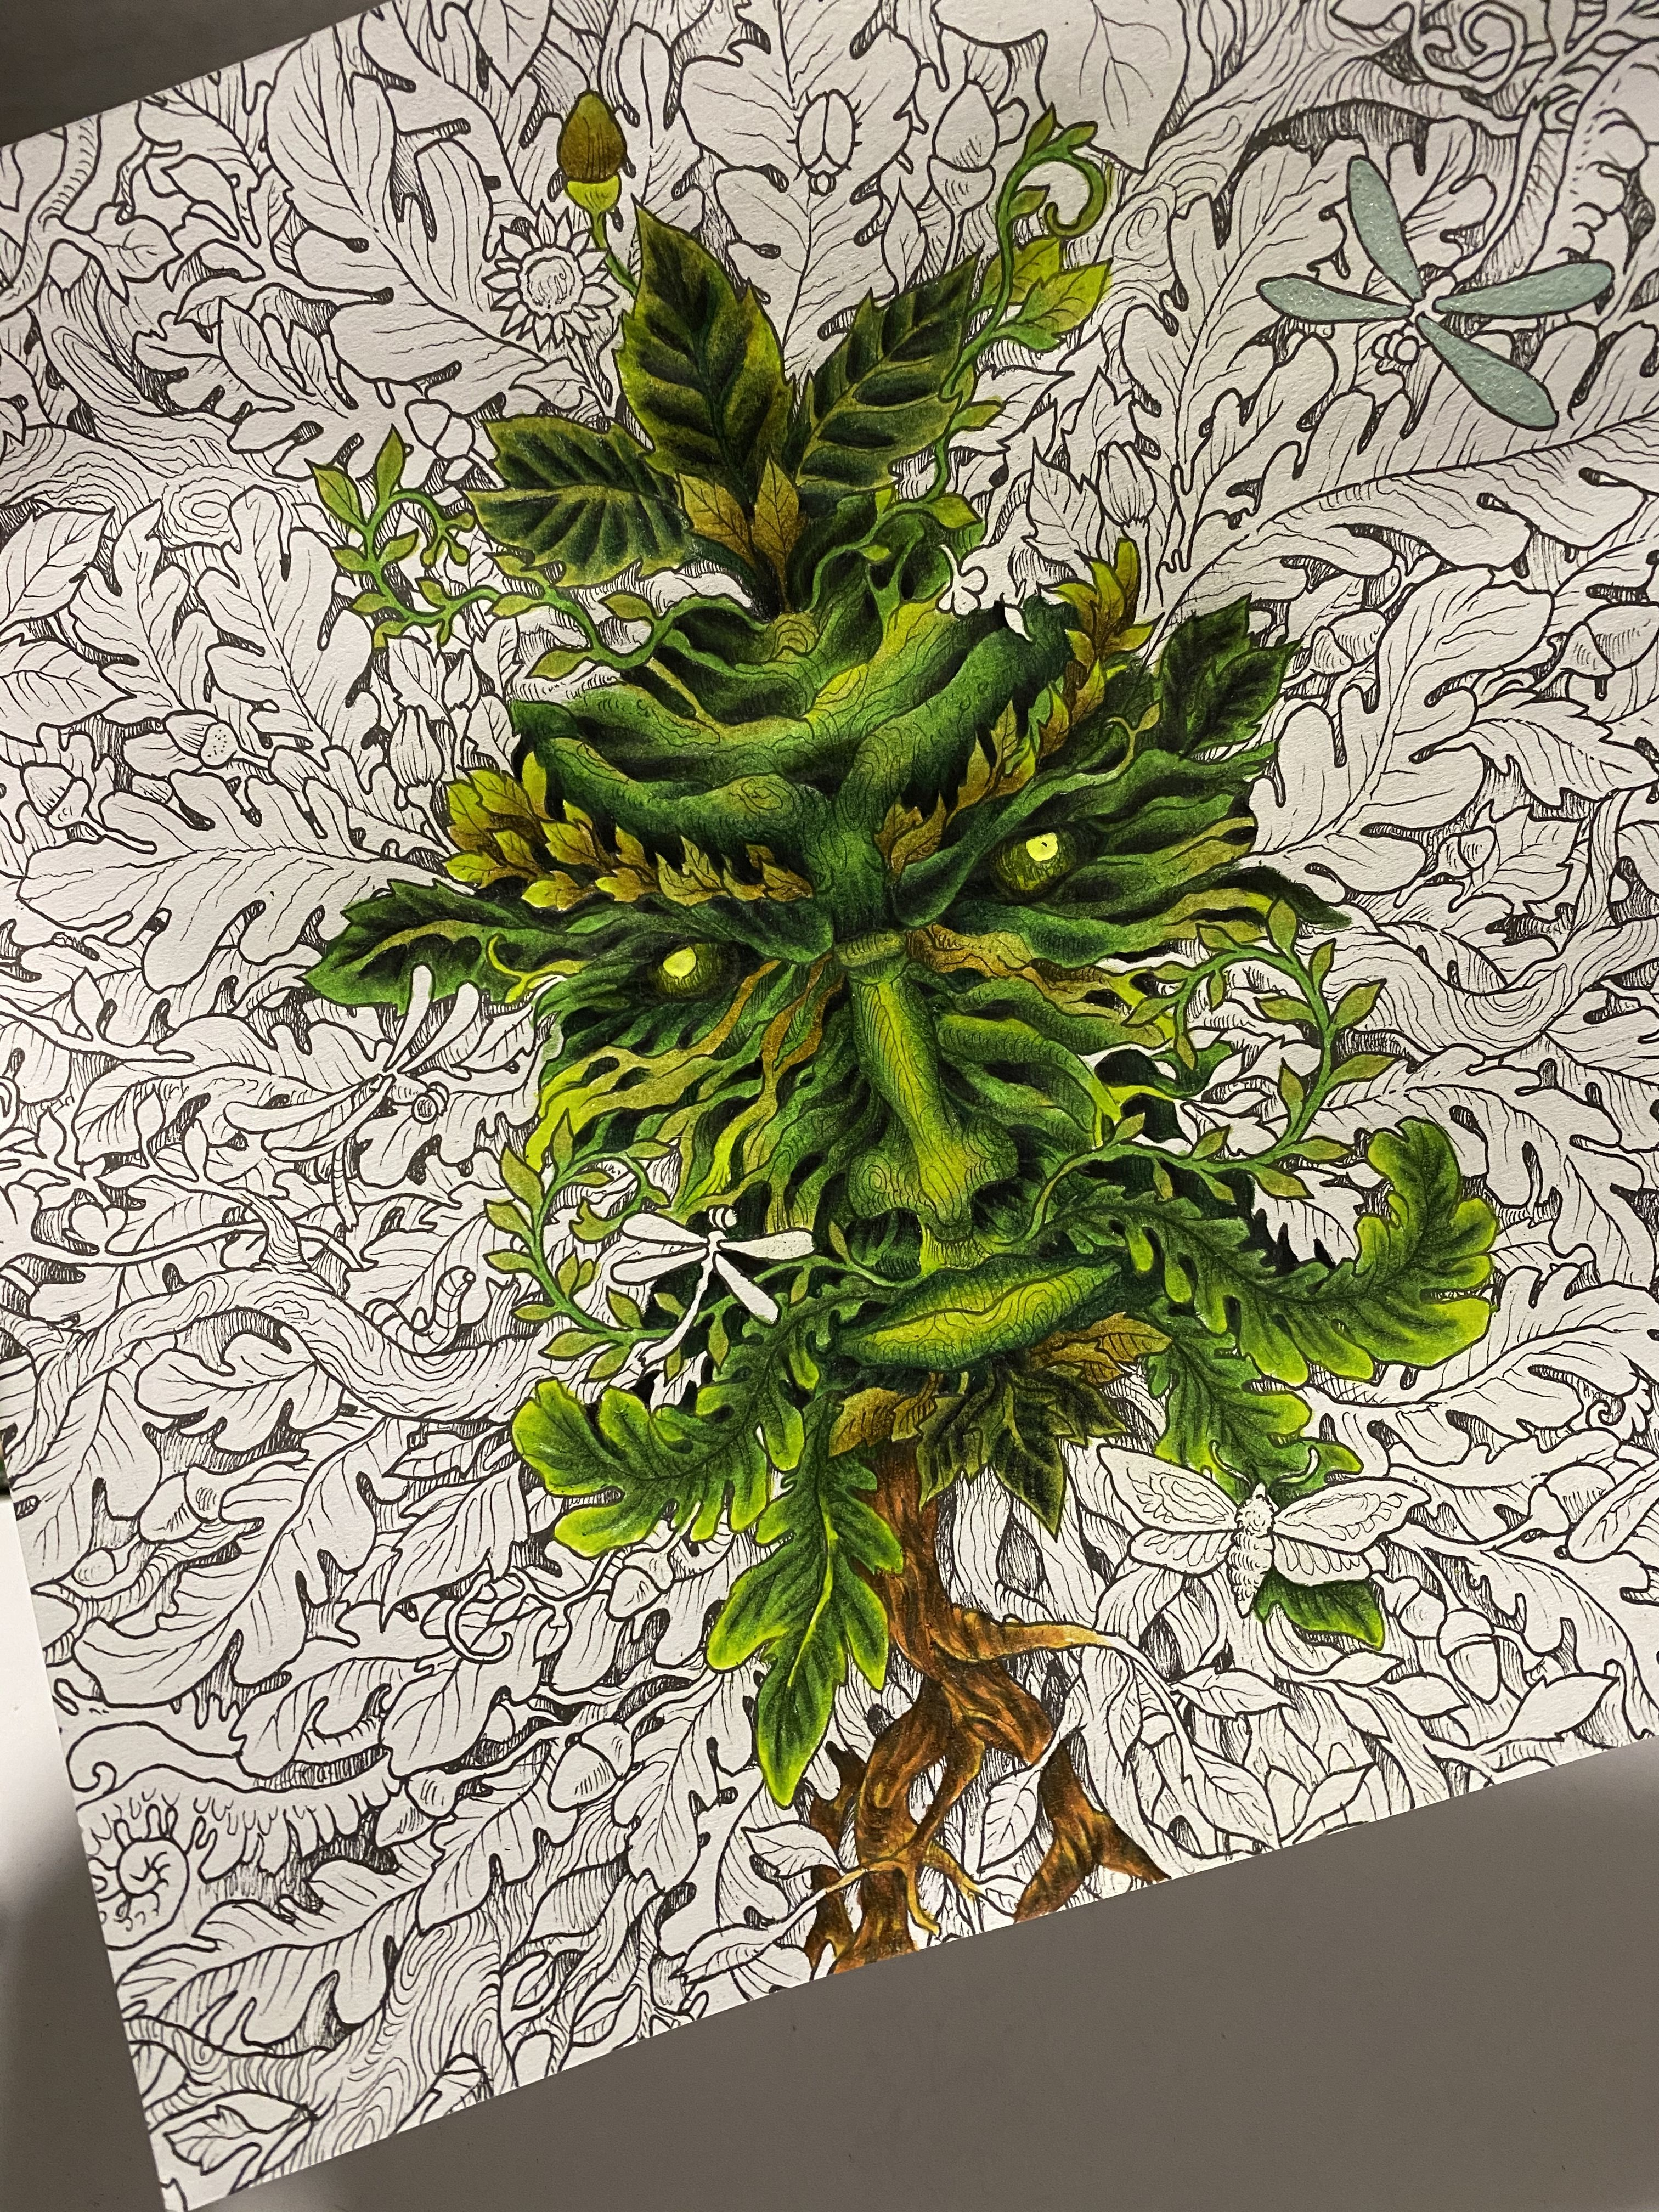 The Green Man In 2020 Coloring Book Art Animorphia Coloring Book Colorful Drawings